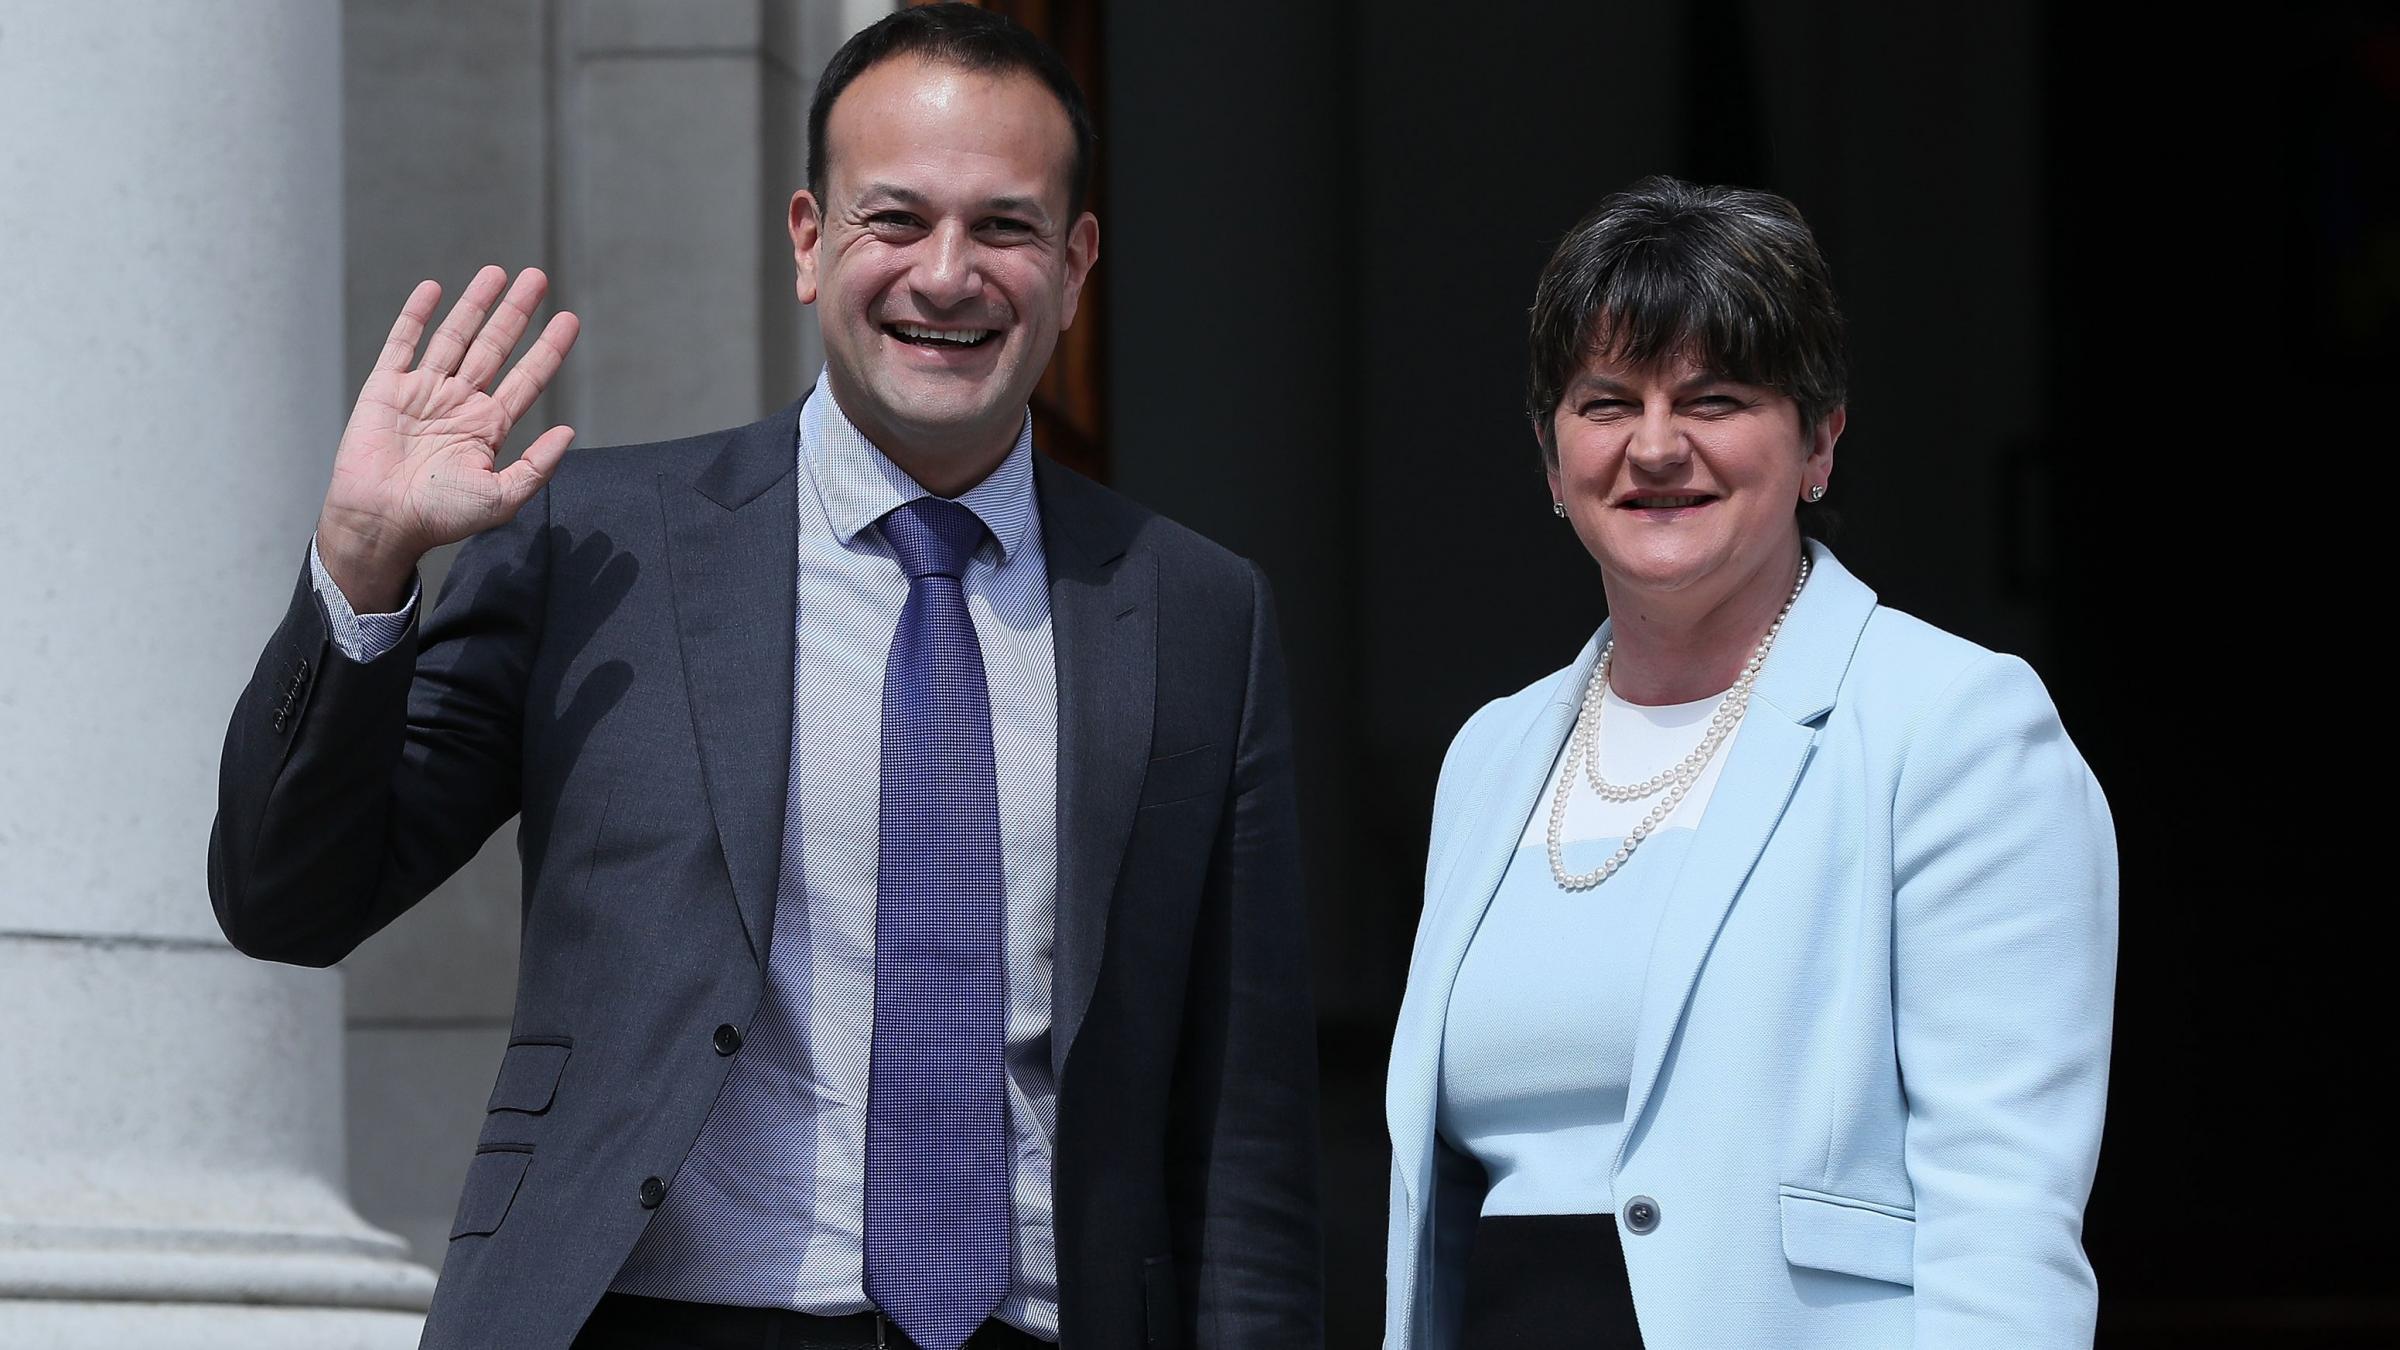 Northern Ireland politics hits PM May's coalition talks